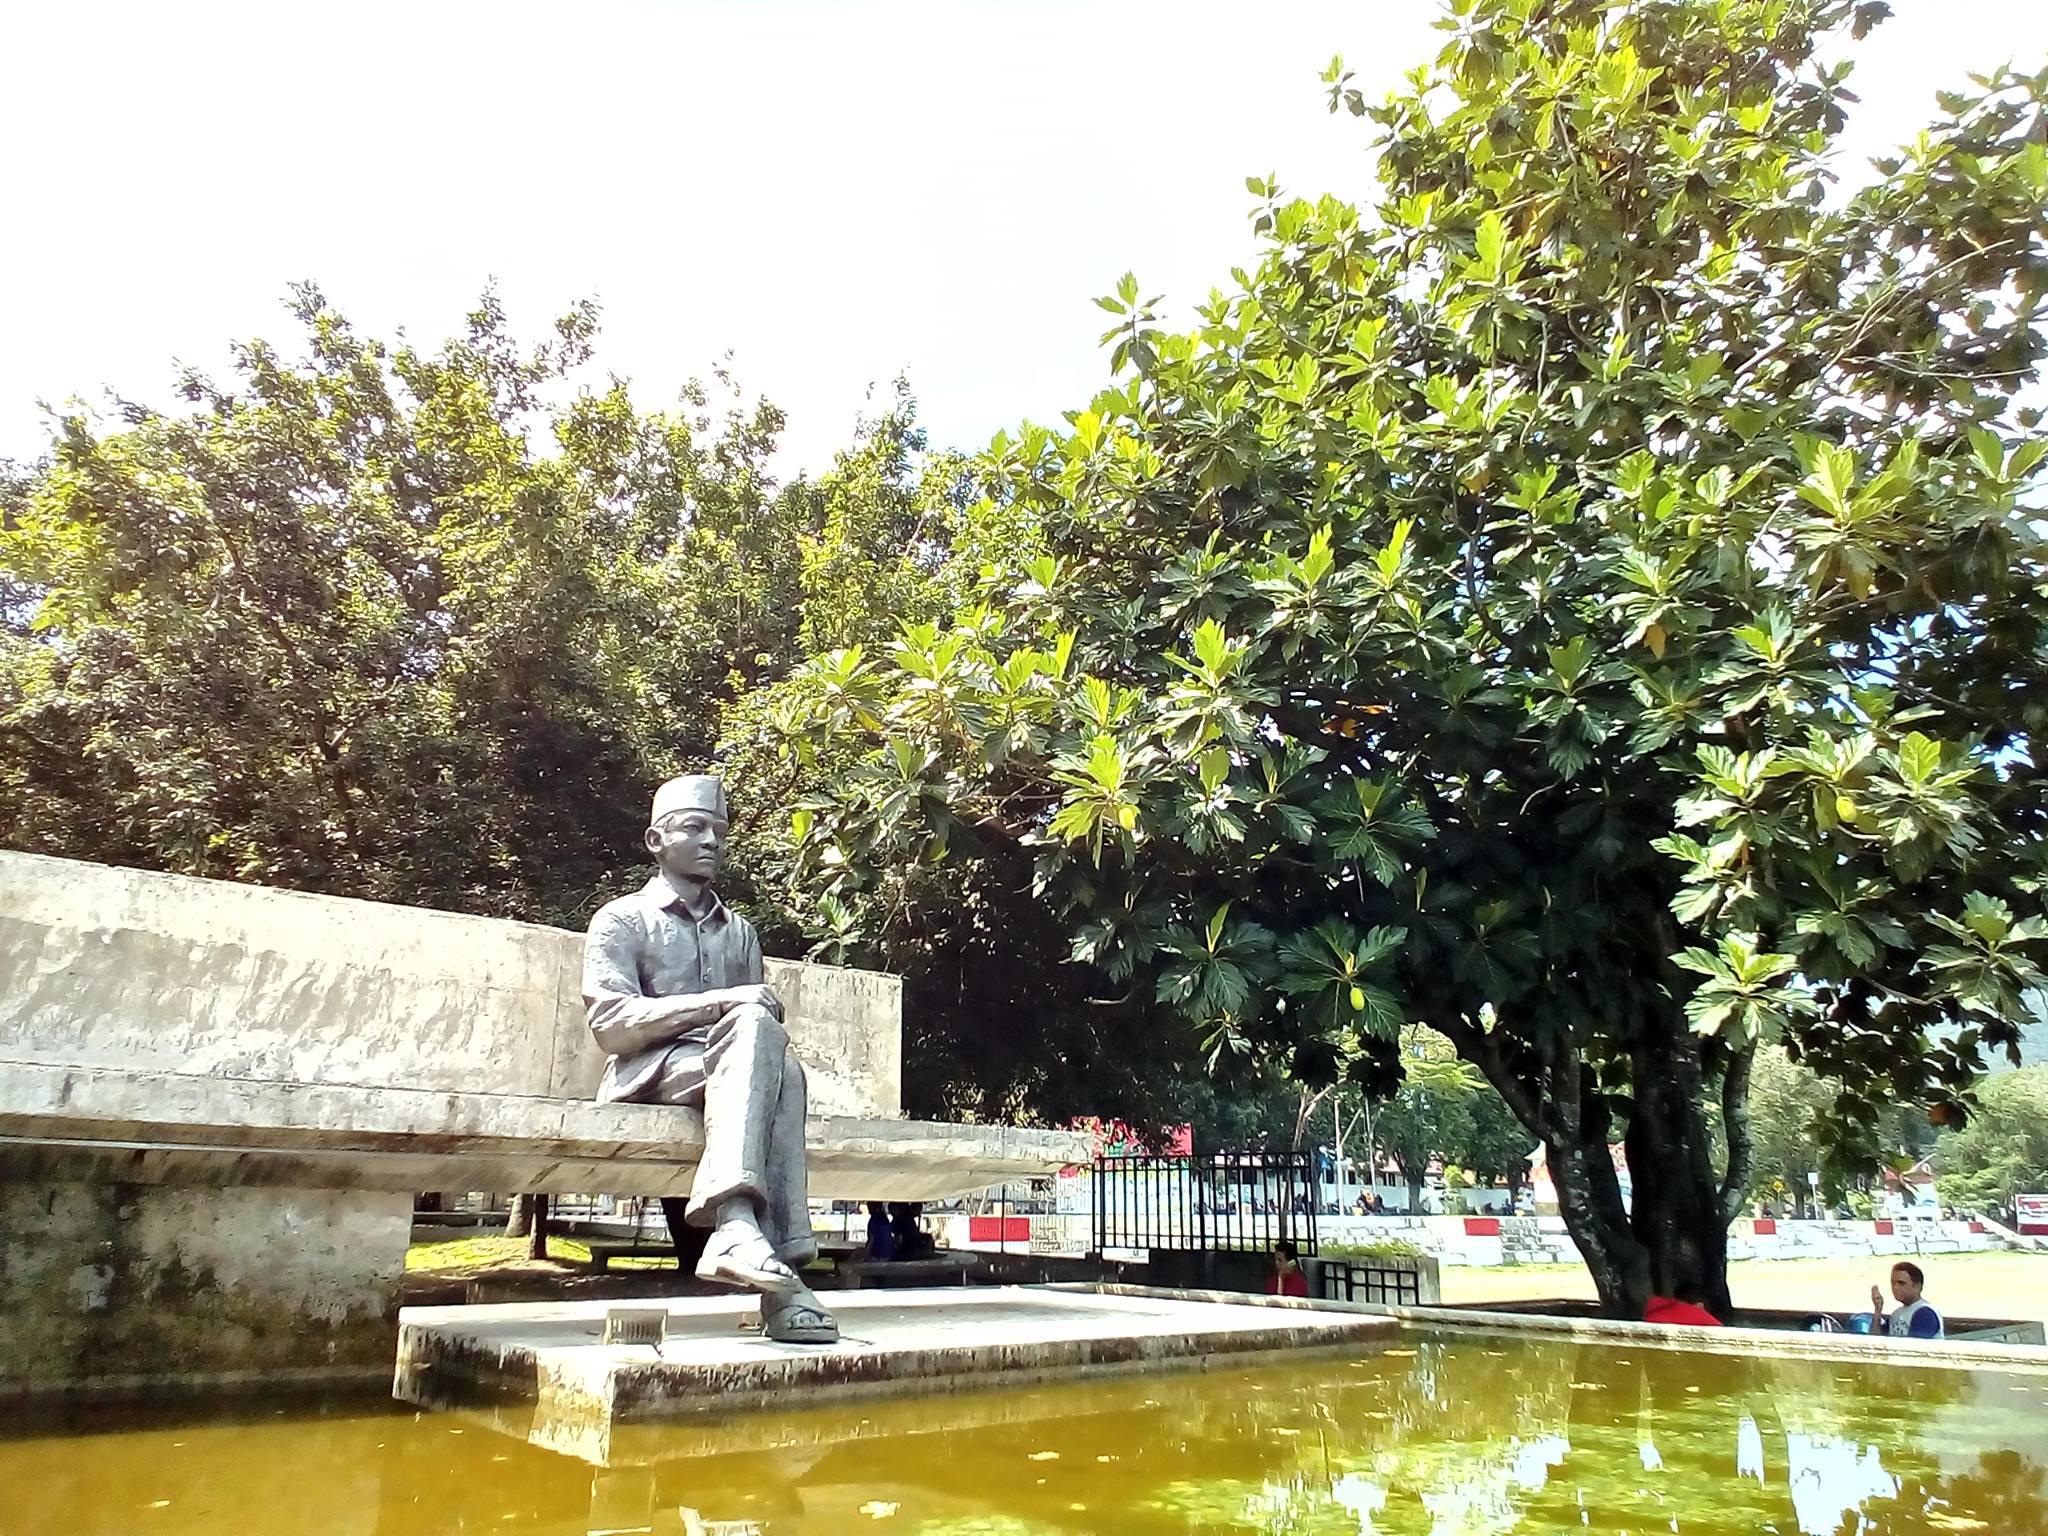 Soekarno statue, reflecting under the Breadfruit Tree - UniBRIDGE